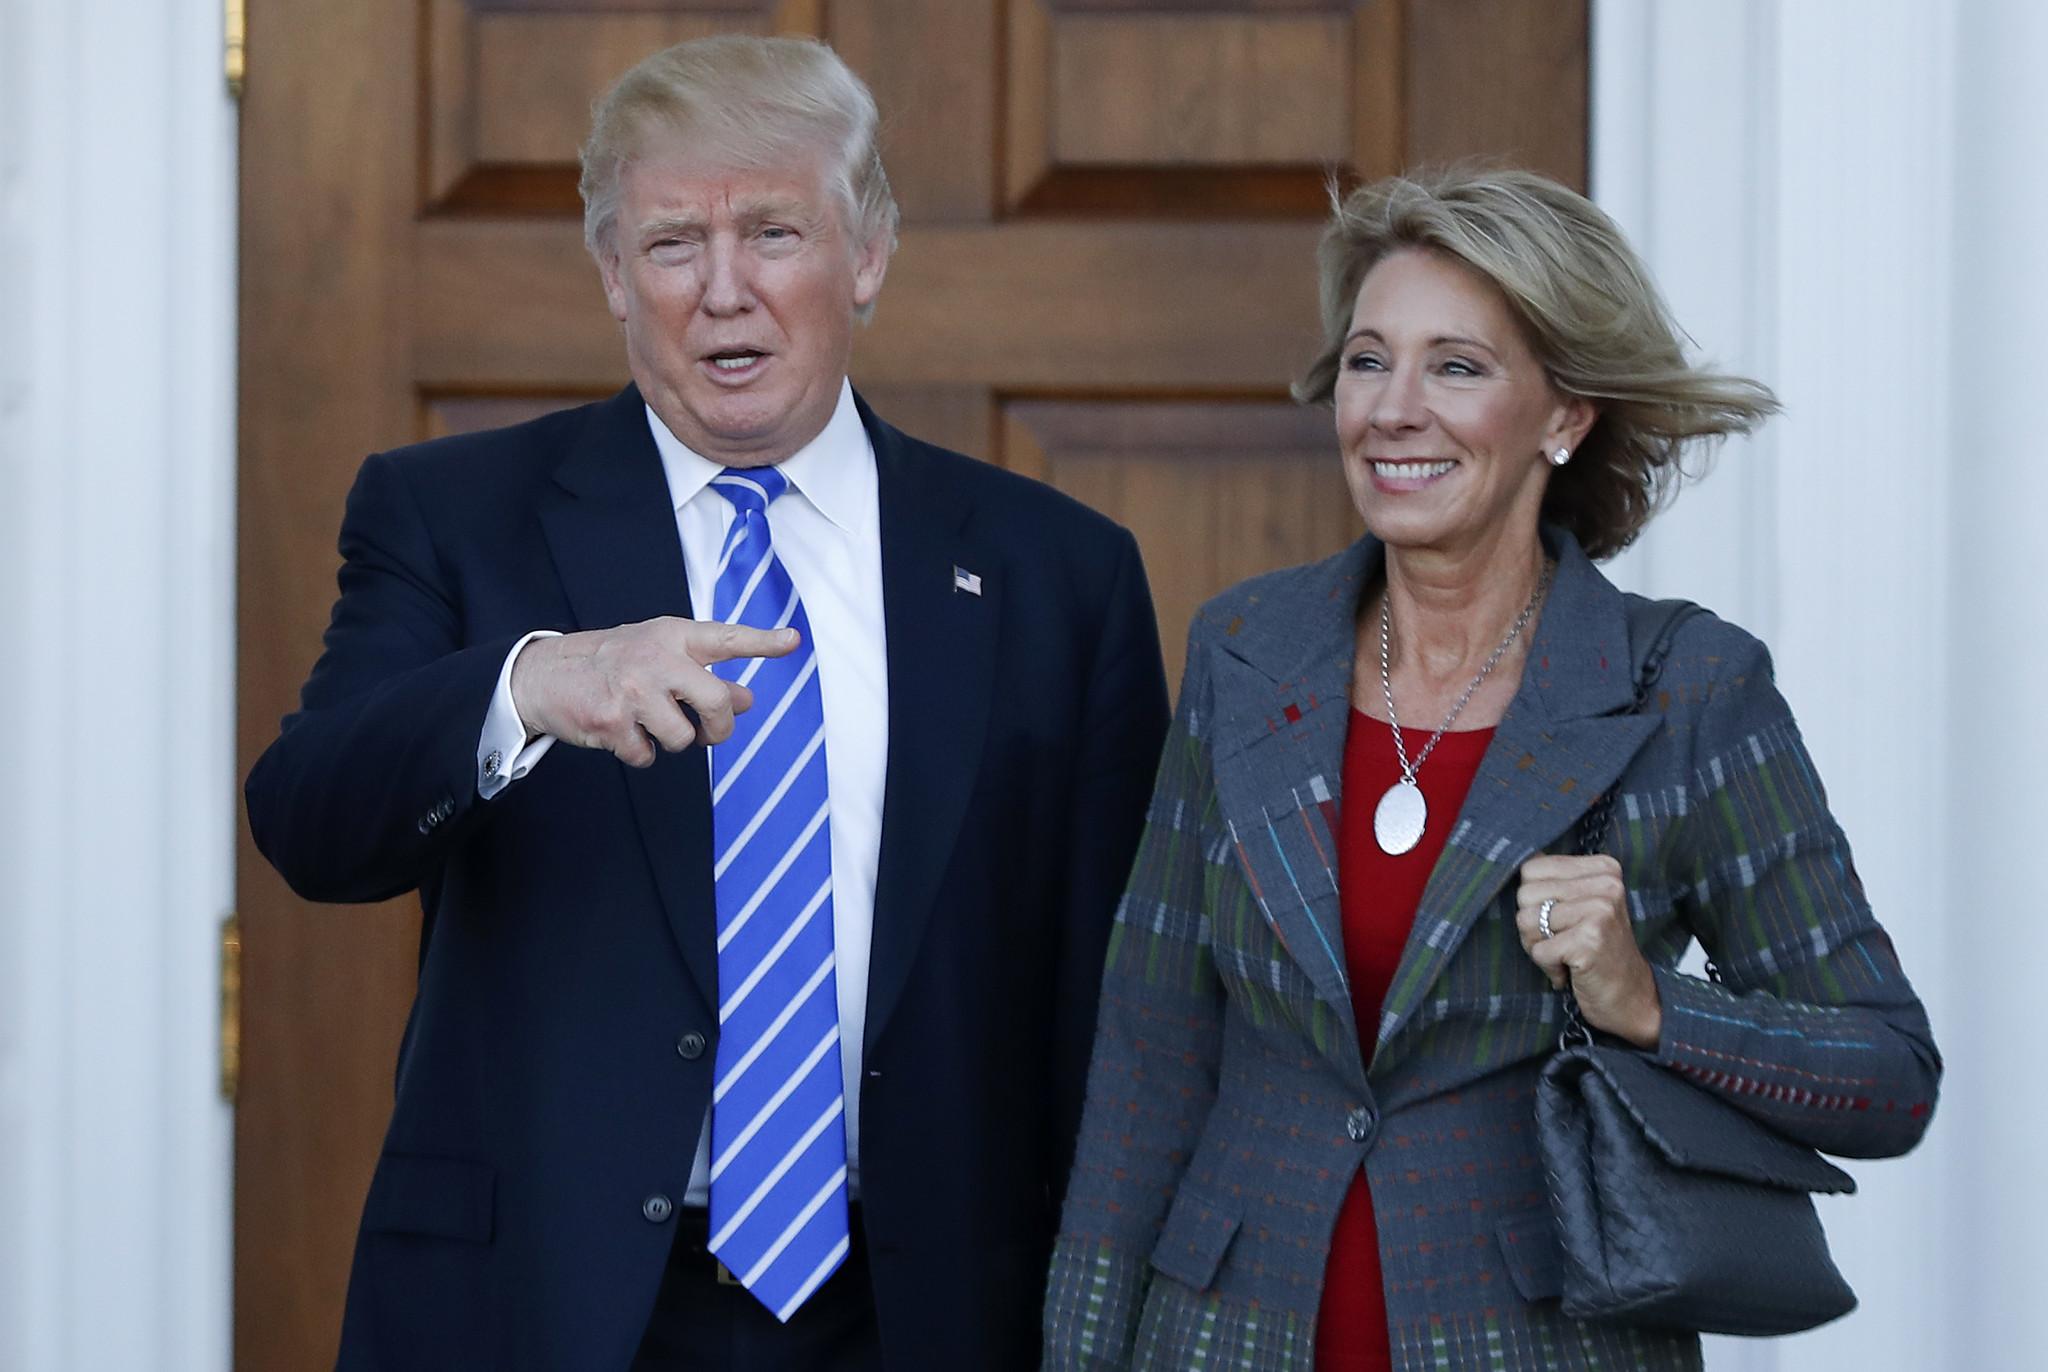 President Trump and Education Secretary Betsy DeVos. (Carolyn Kaster / Associated Press)